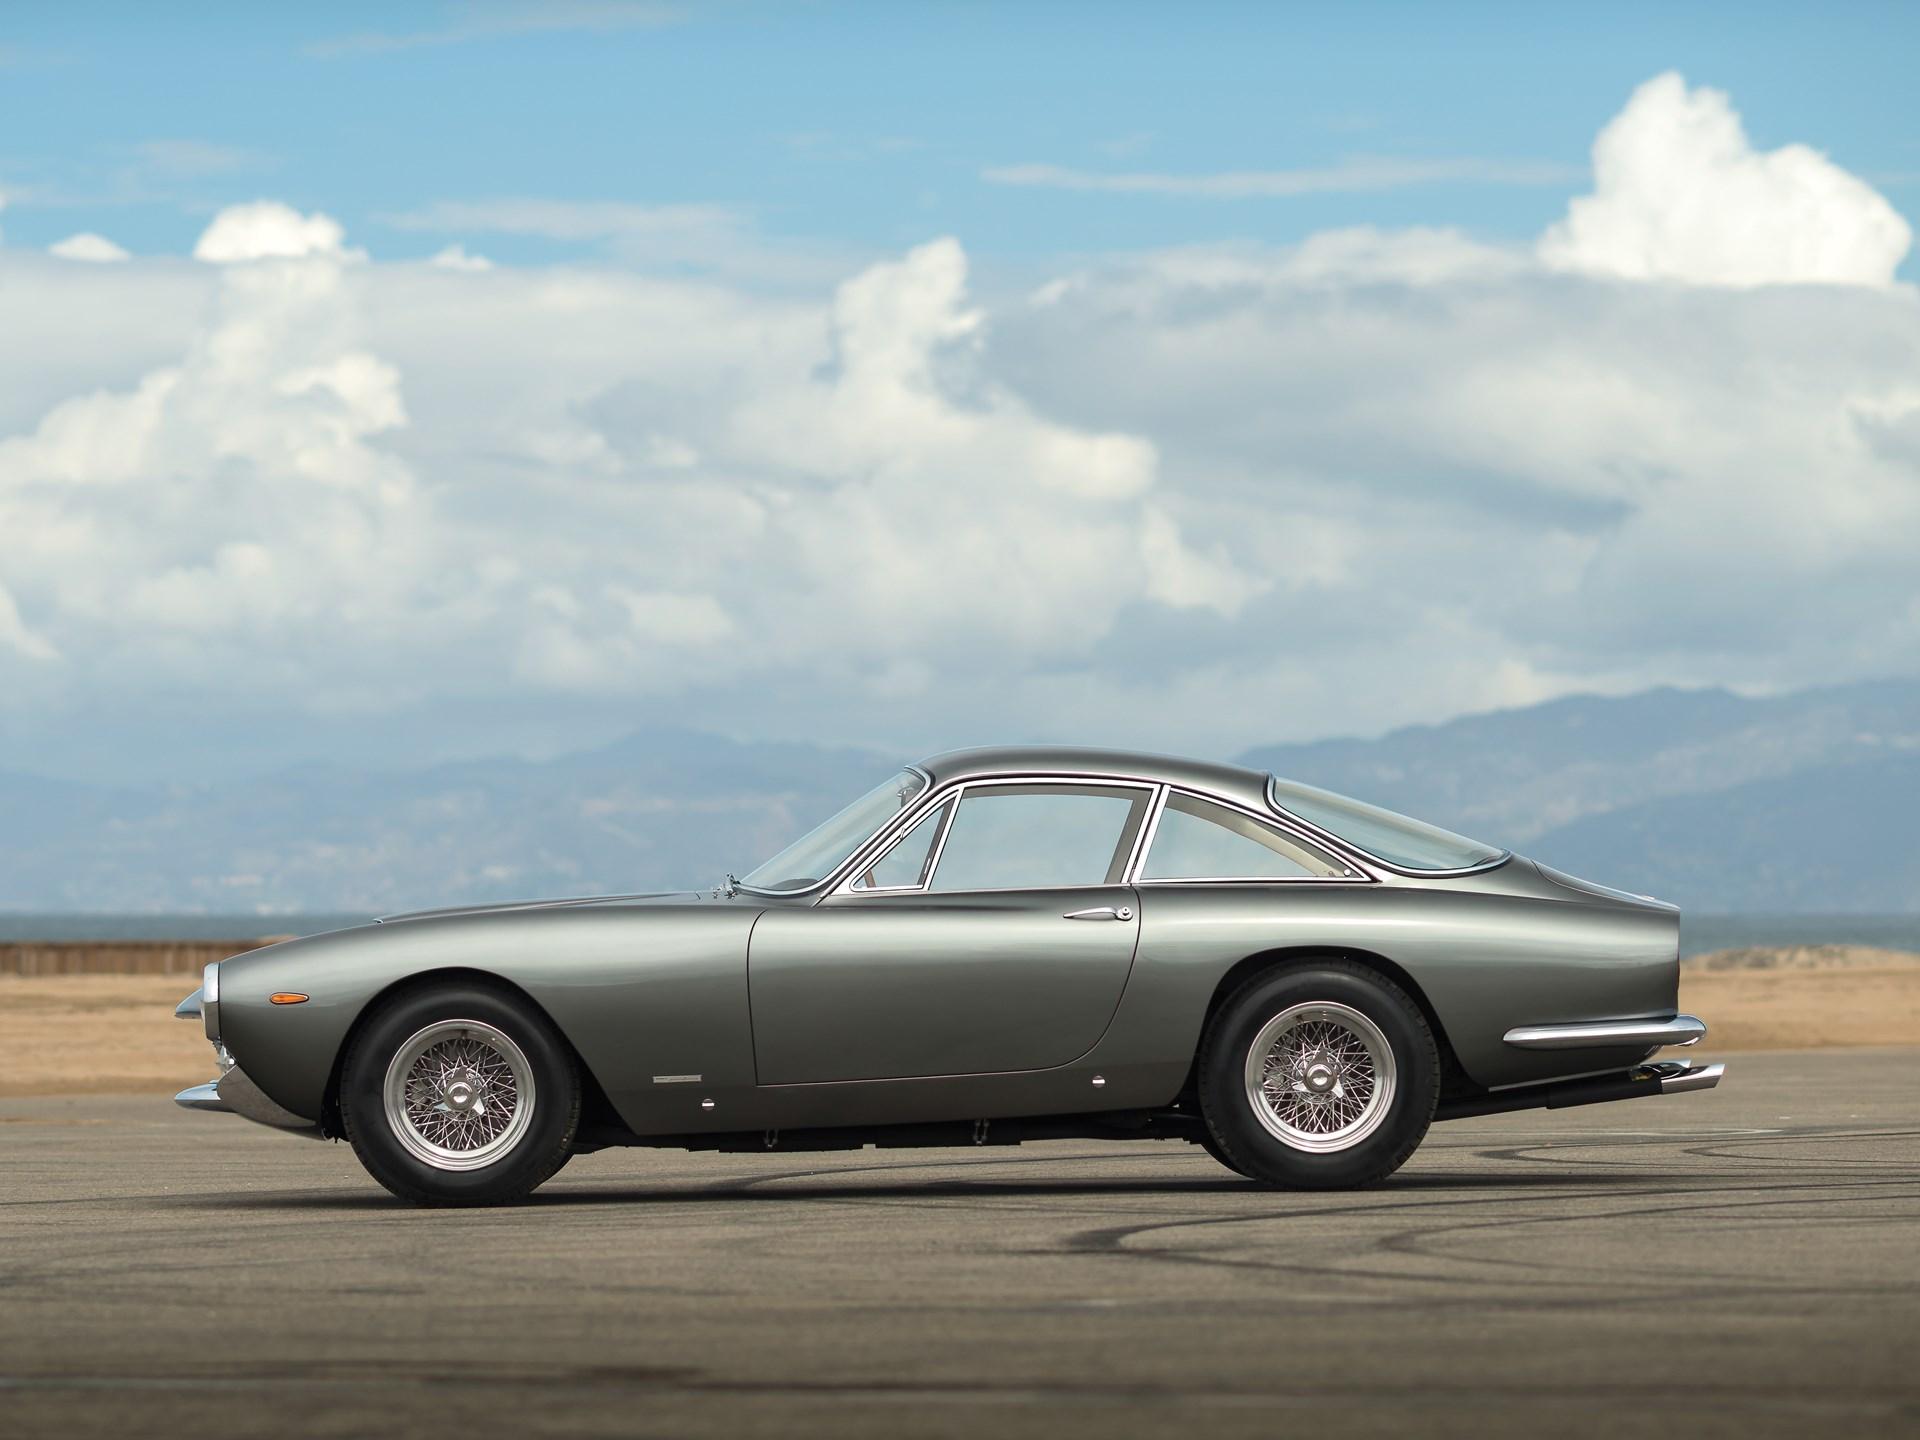 1963 Ferrari 250 GT/L Berlinetta Lusso by Scaglietti